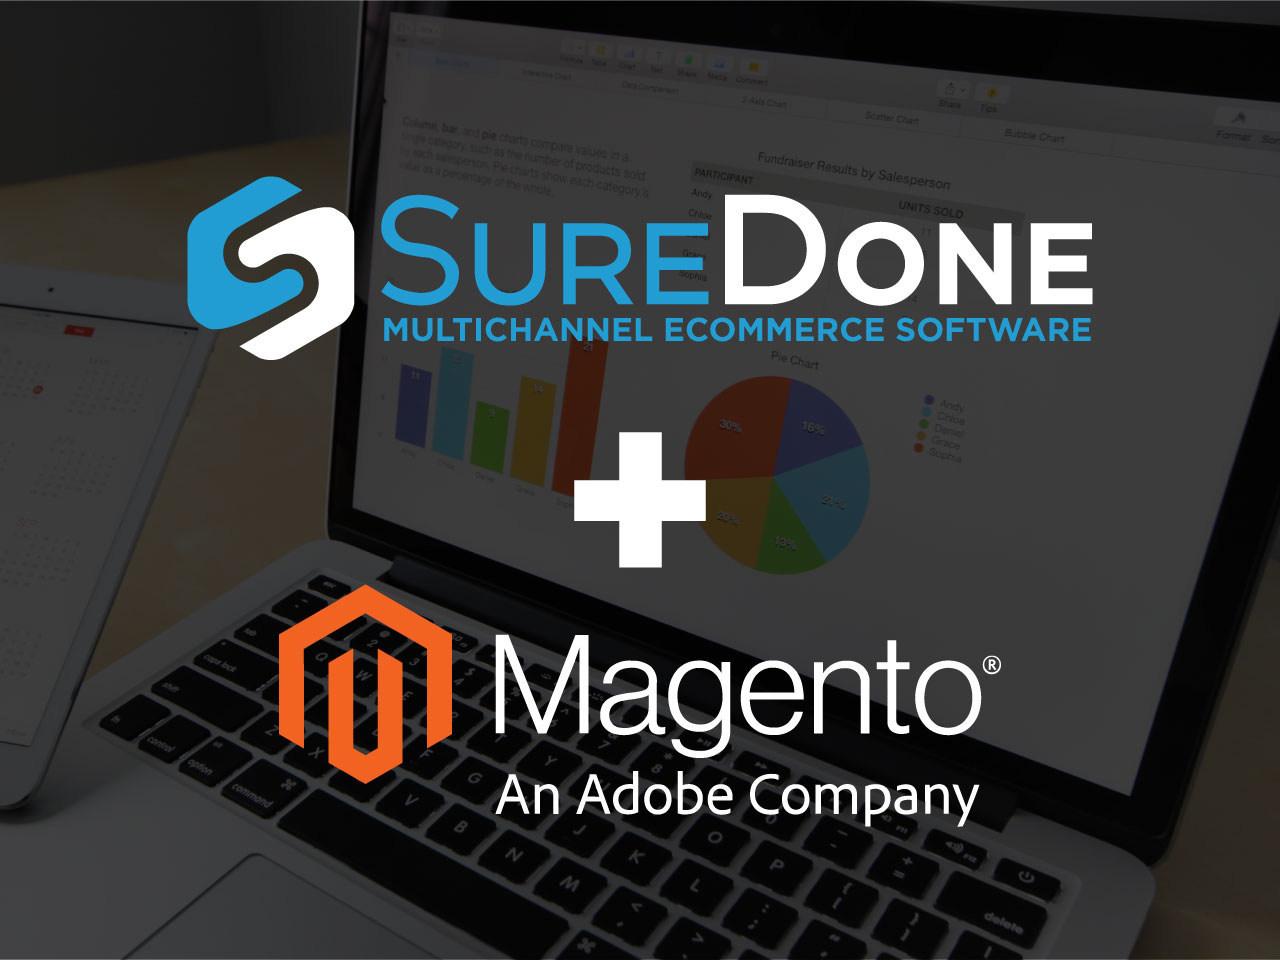 Adobe Magento Commerce Support Added to SureDone Multichannel E-Commerce Platform